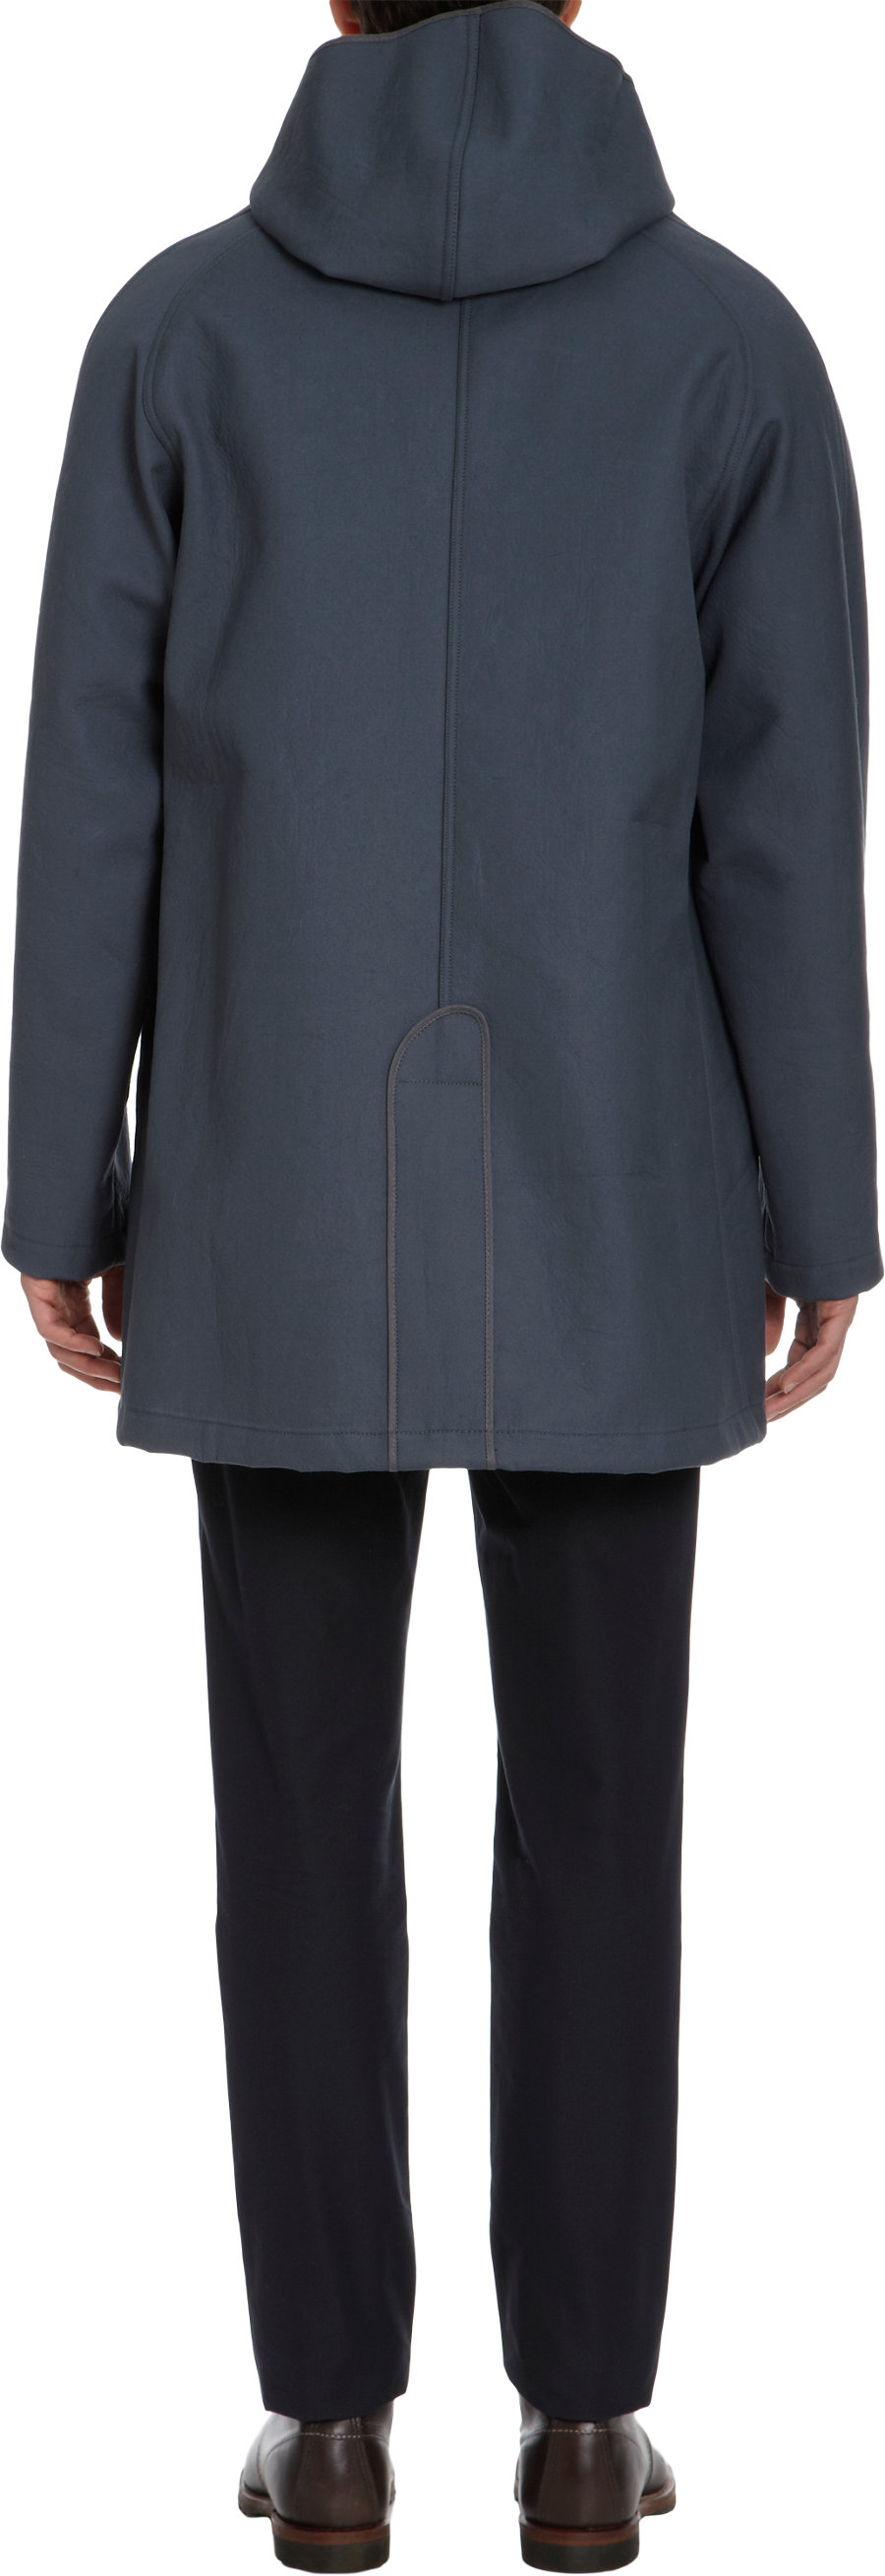 Nigel Cabourn Bench Coat In Gray For Men Lyst